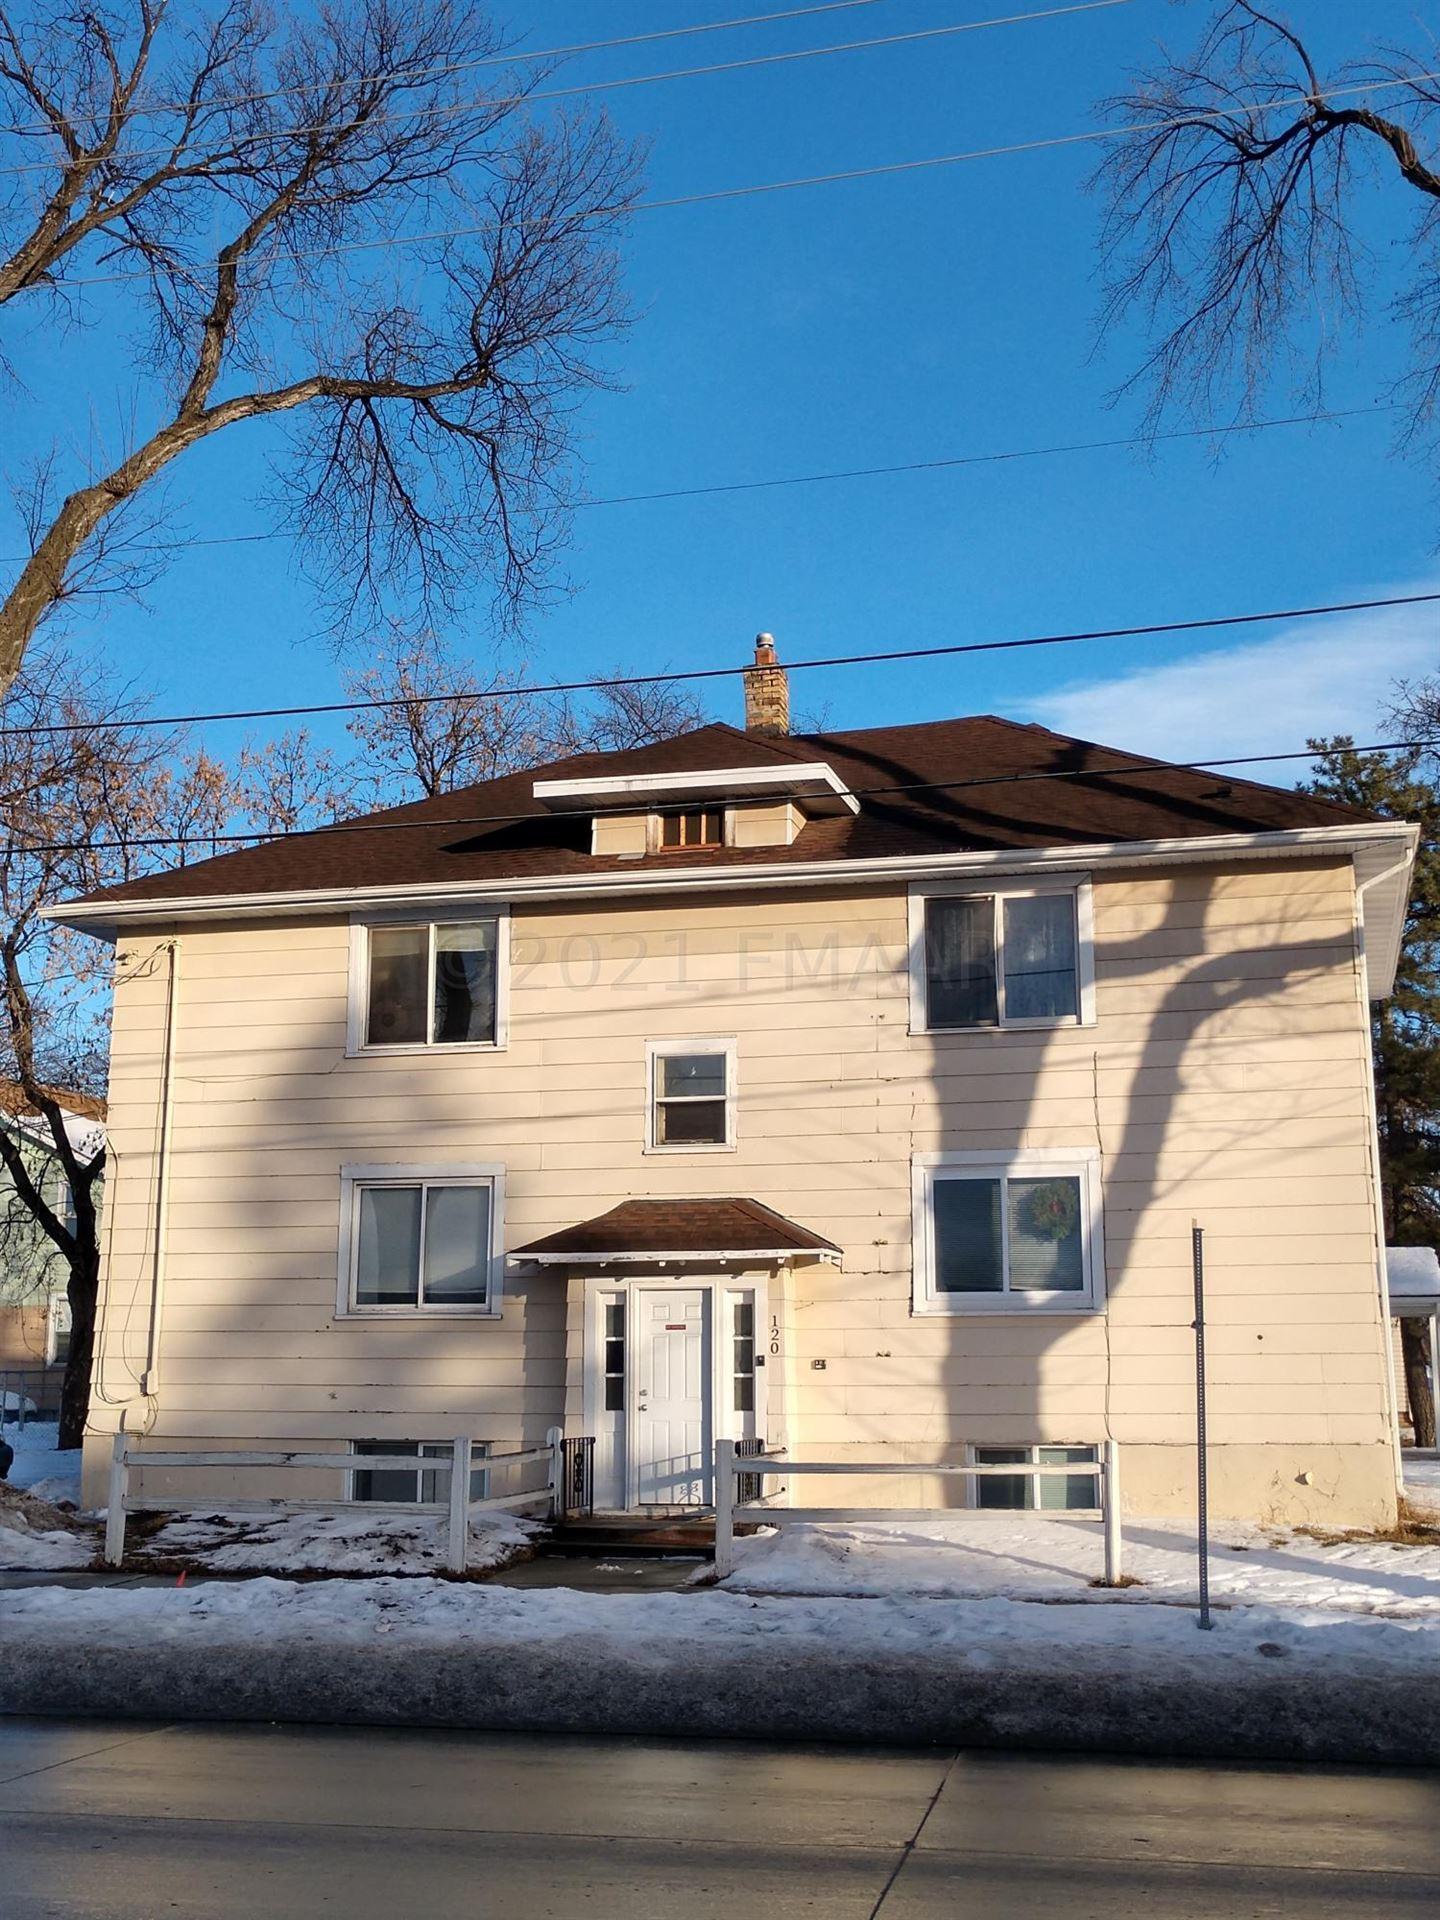 120 UNIVERSITY Drive S, Fargo, ND 58103 - #: 21-685